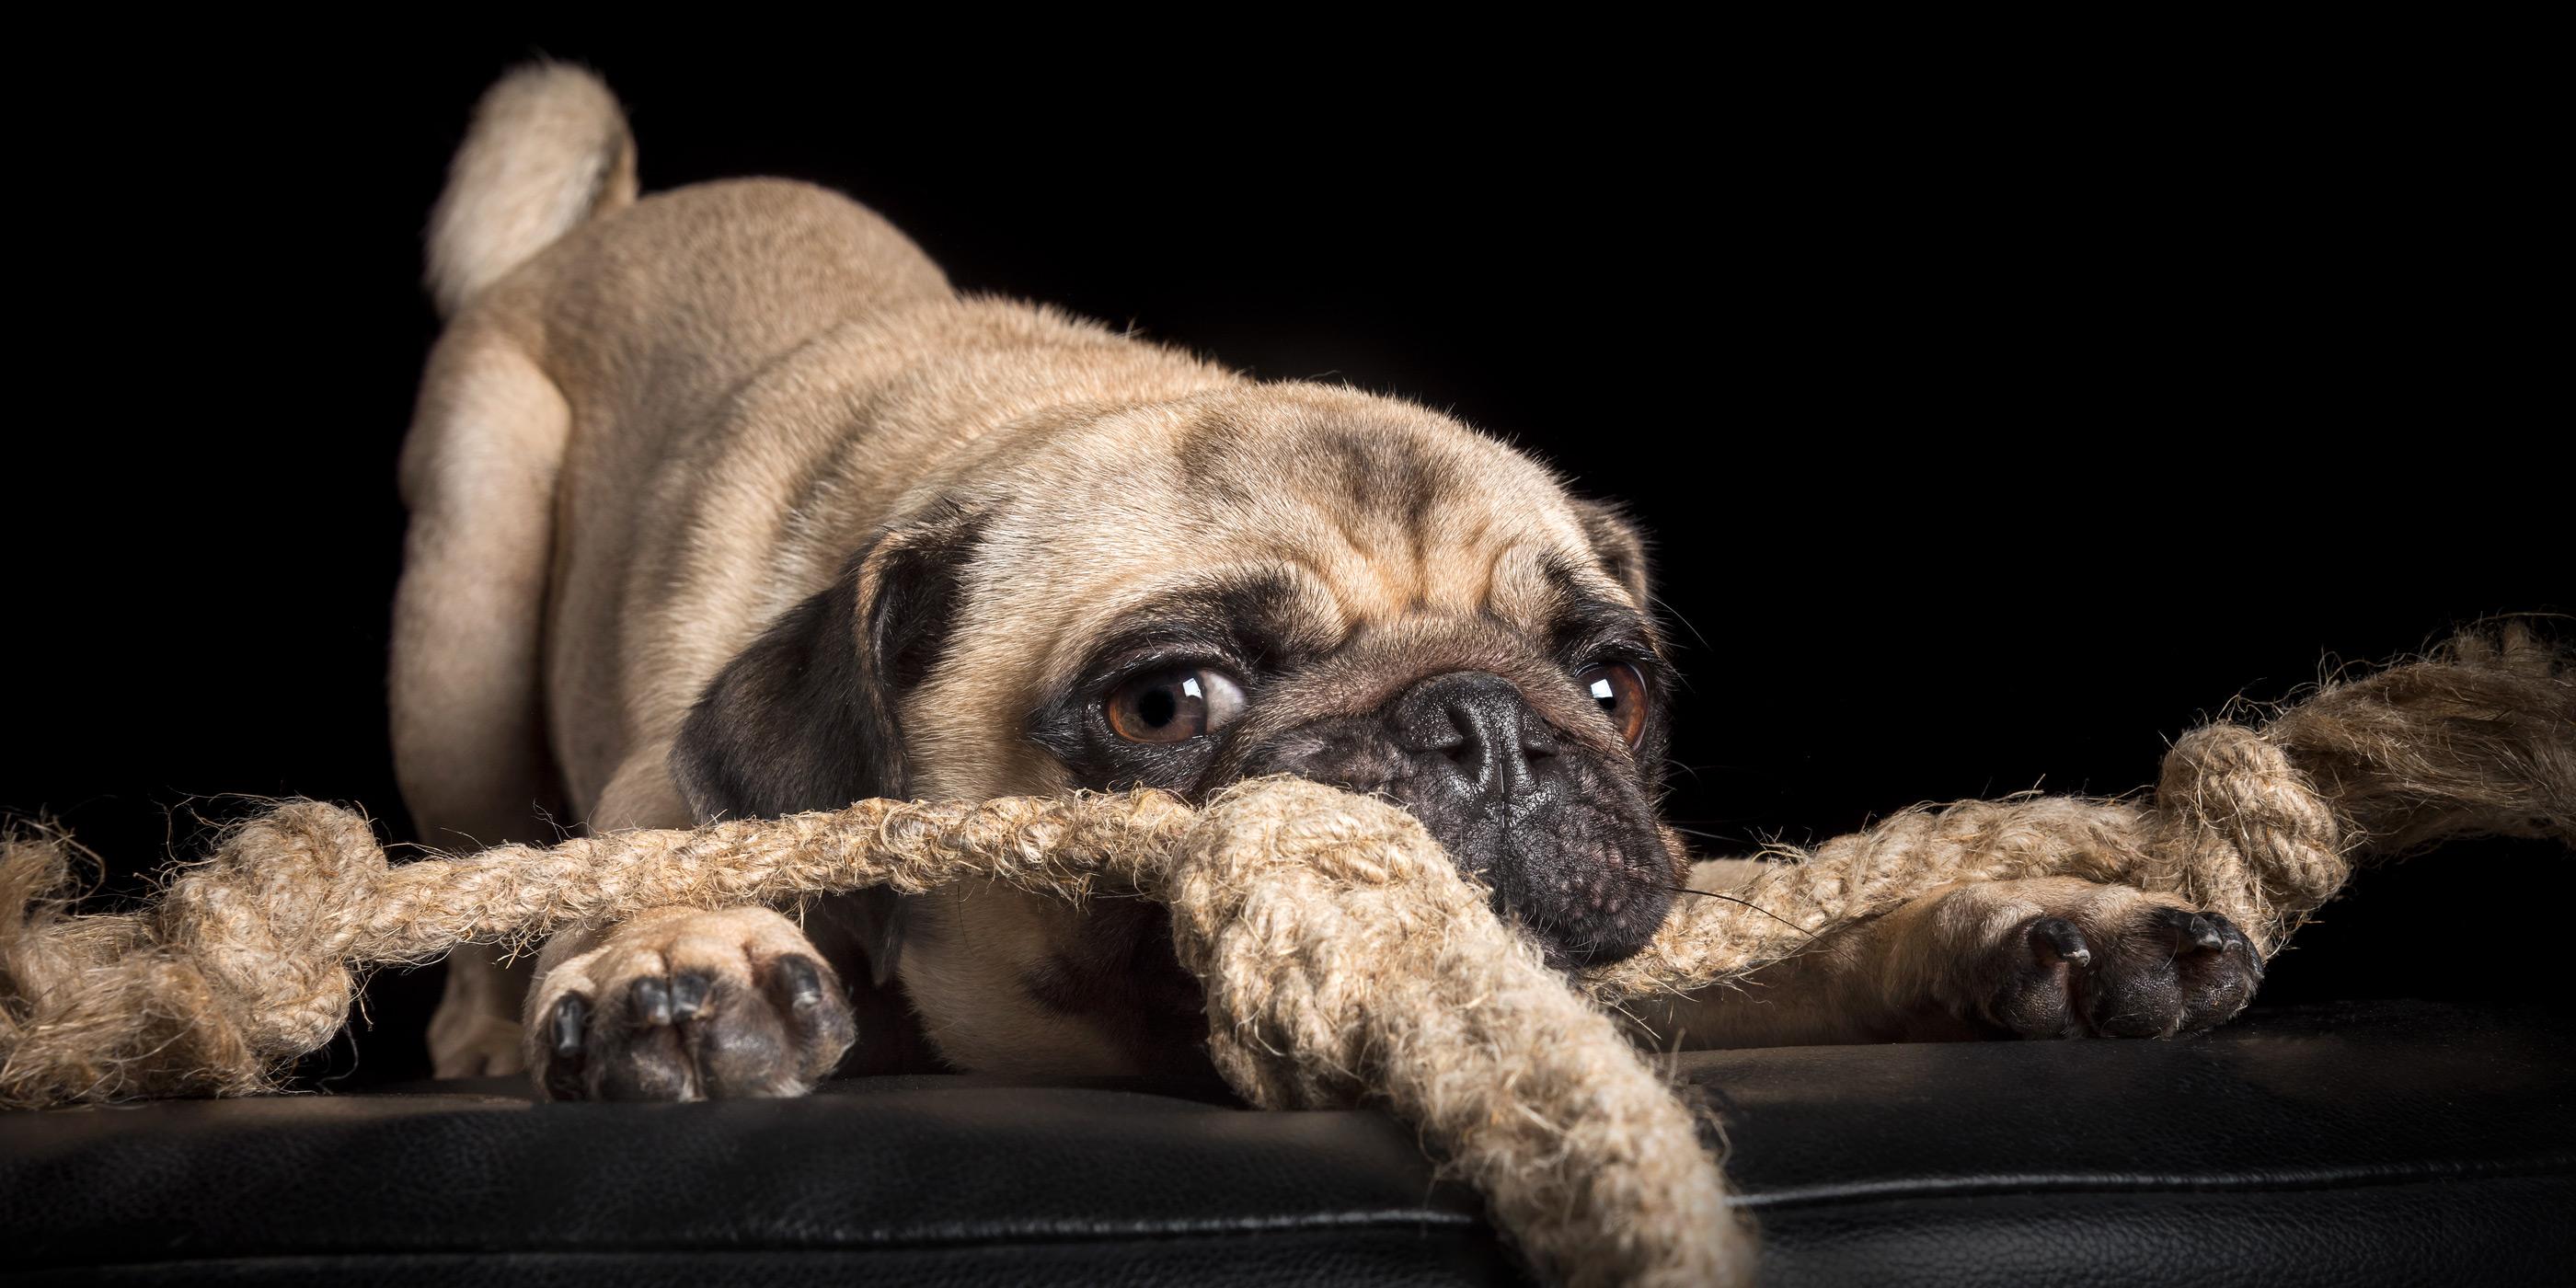 pug having a tug